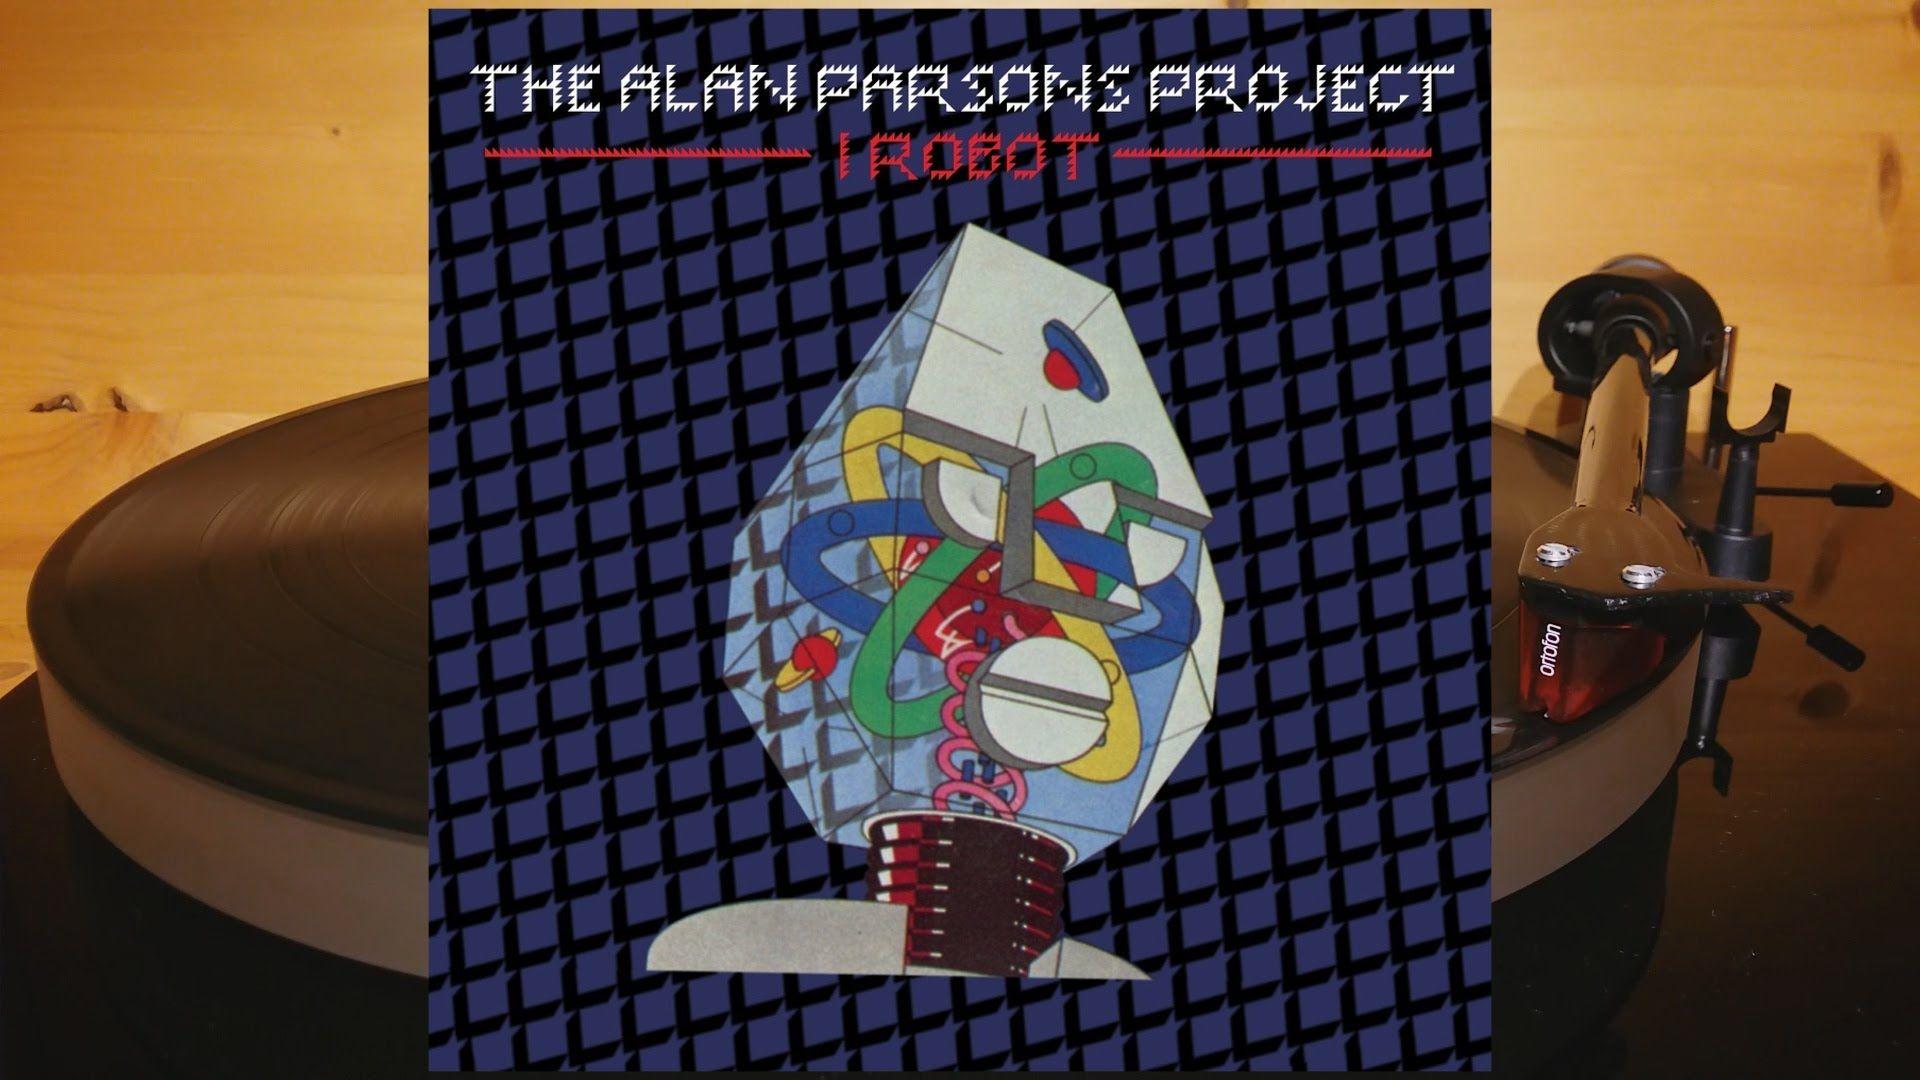 The Alan Parsons Project I Robot Vinyl Tracklist 01 I Robot